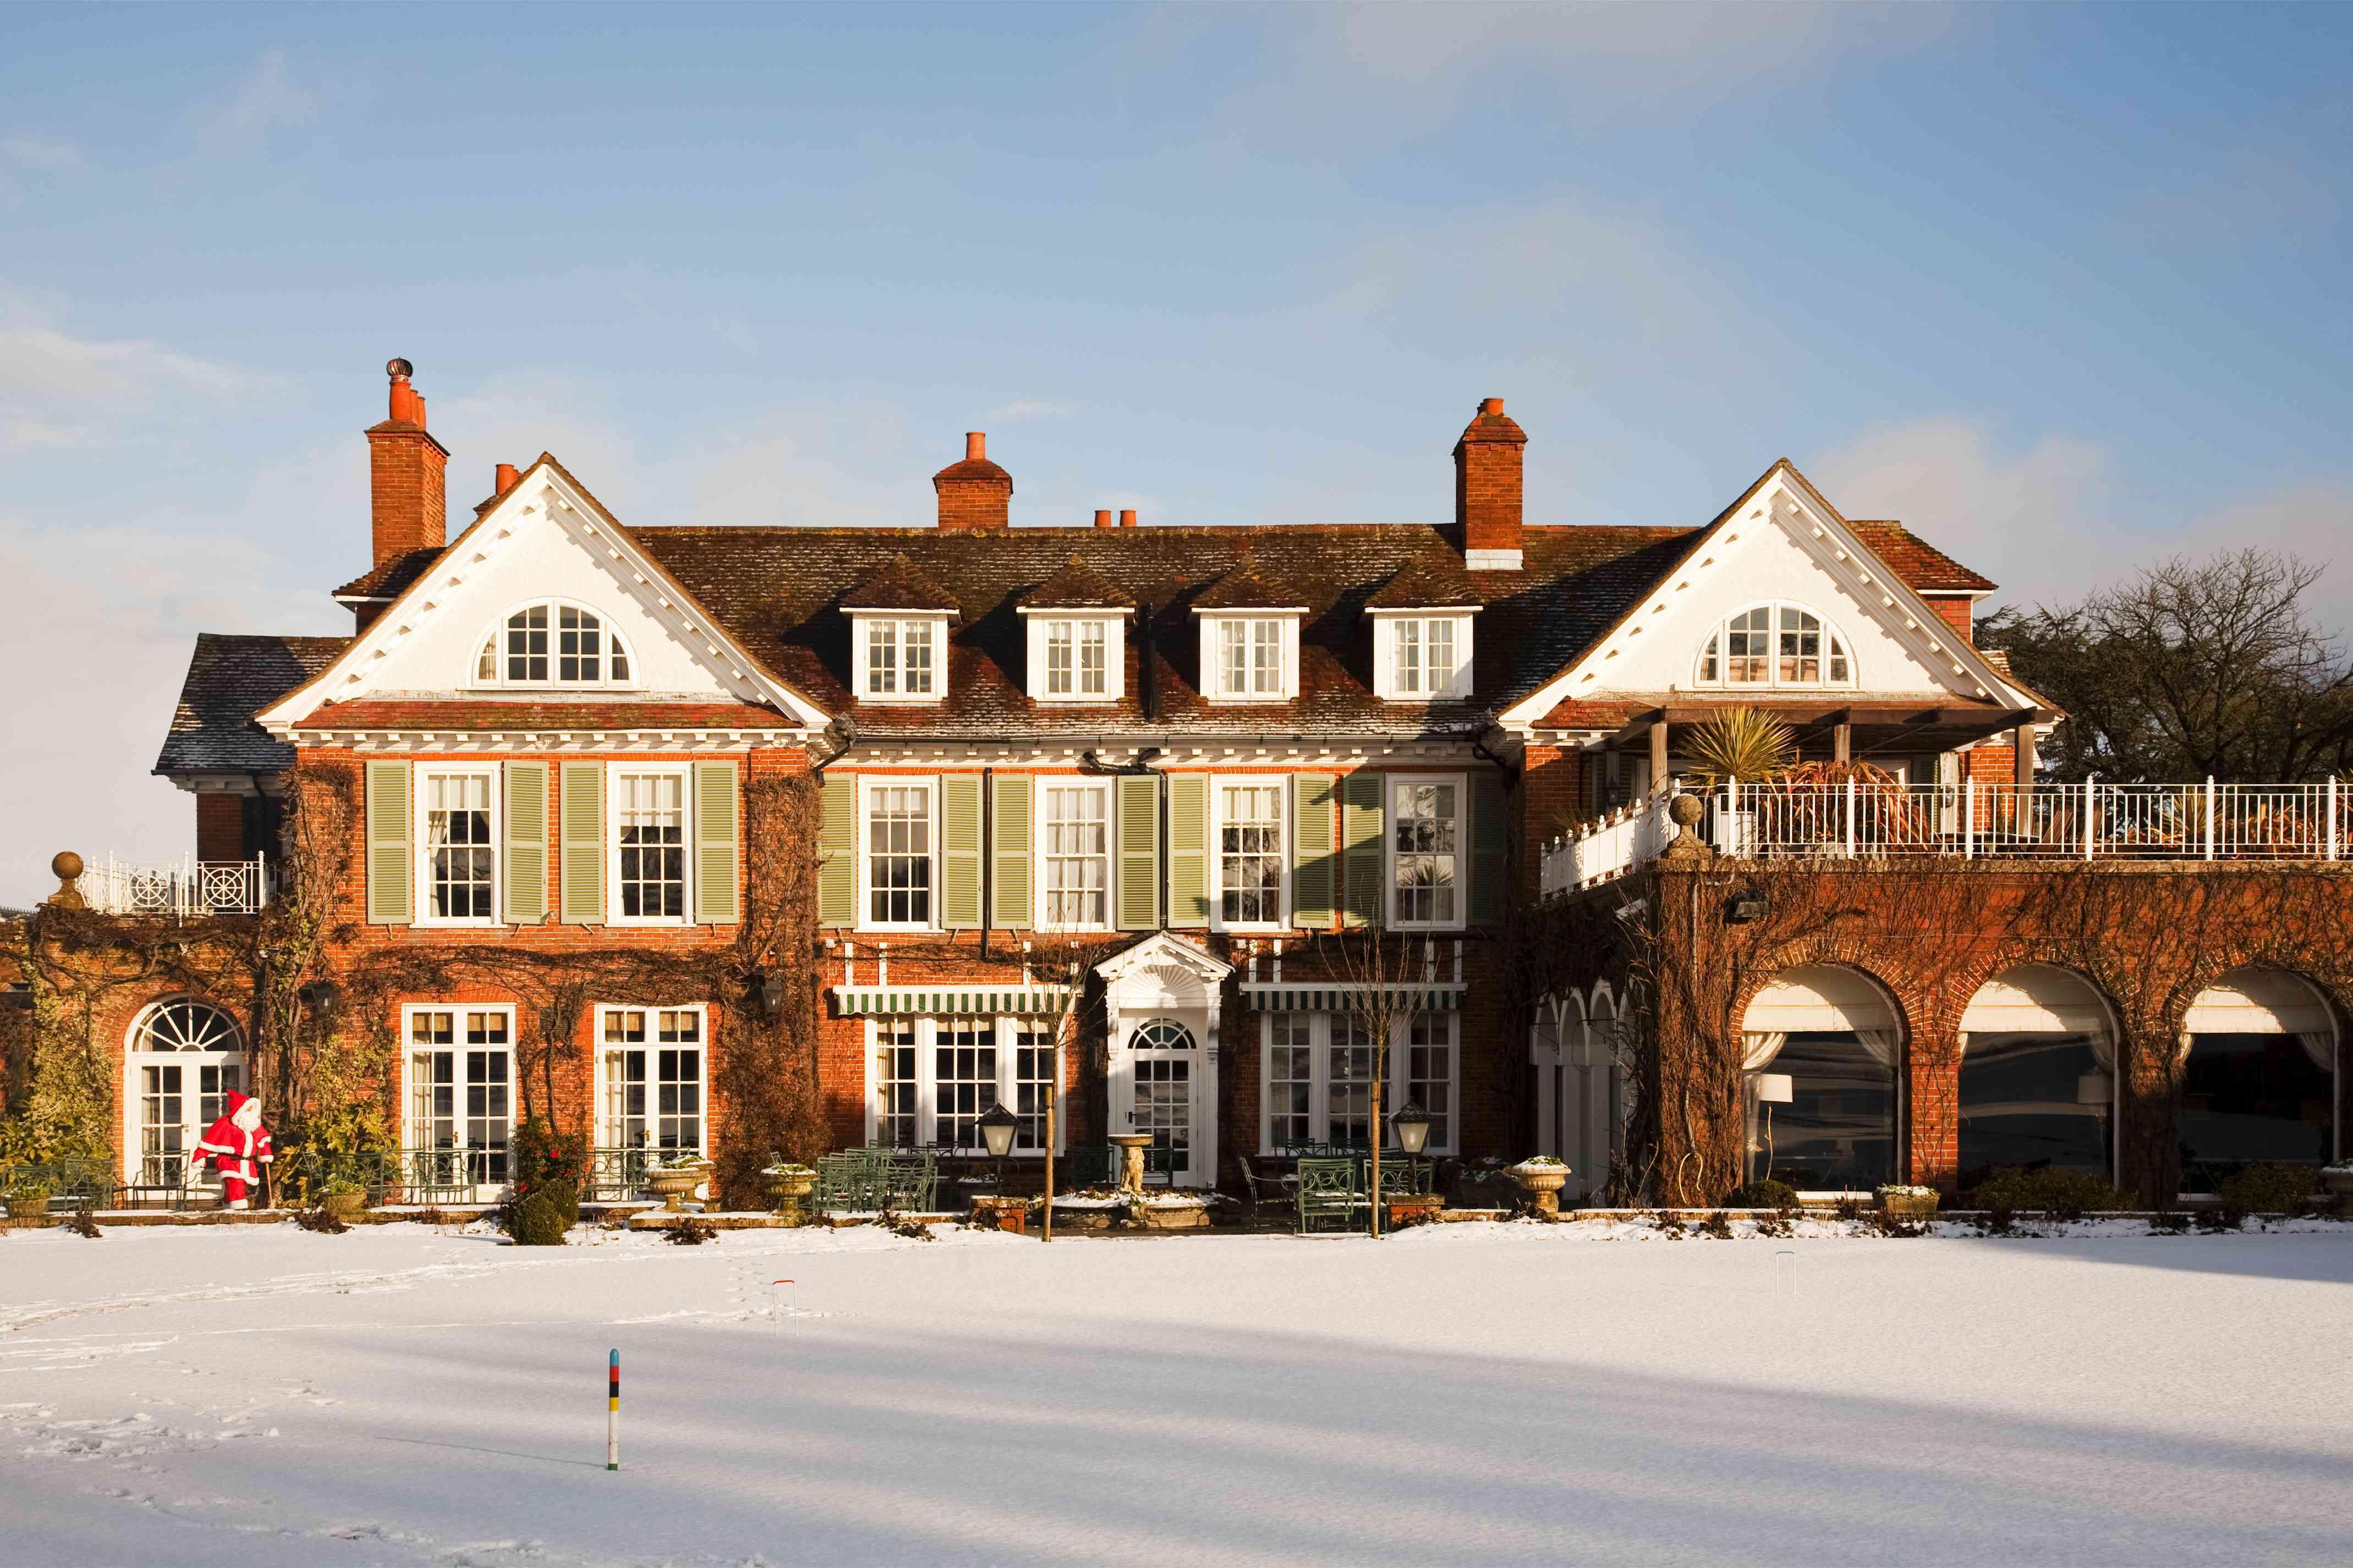 Chewton Glen, an English residence, in the winter